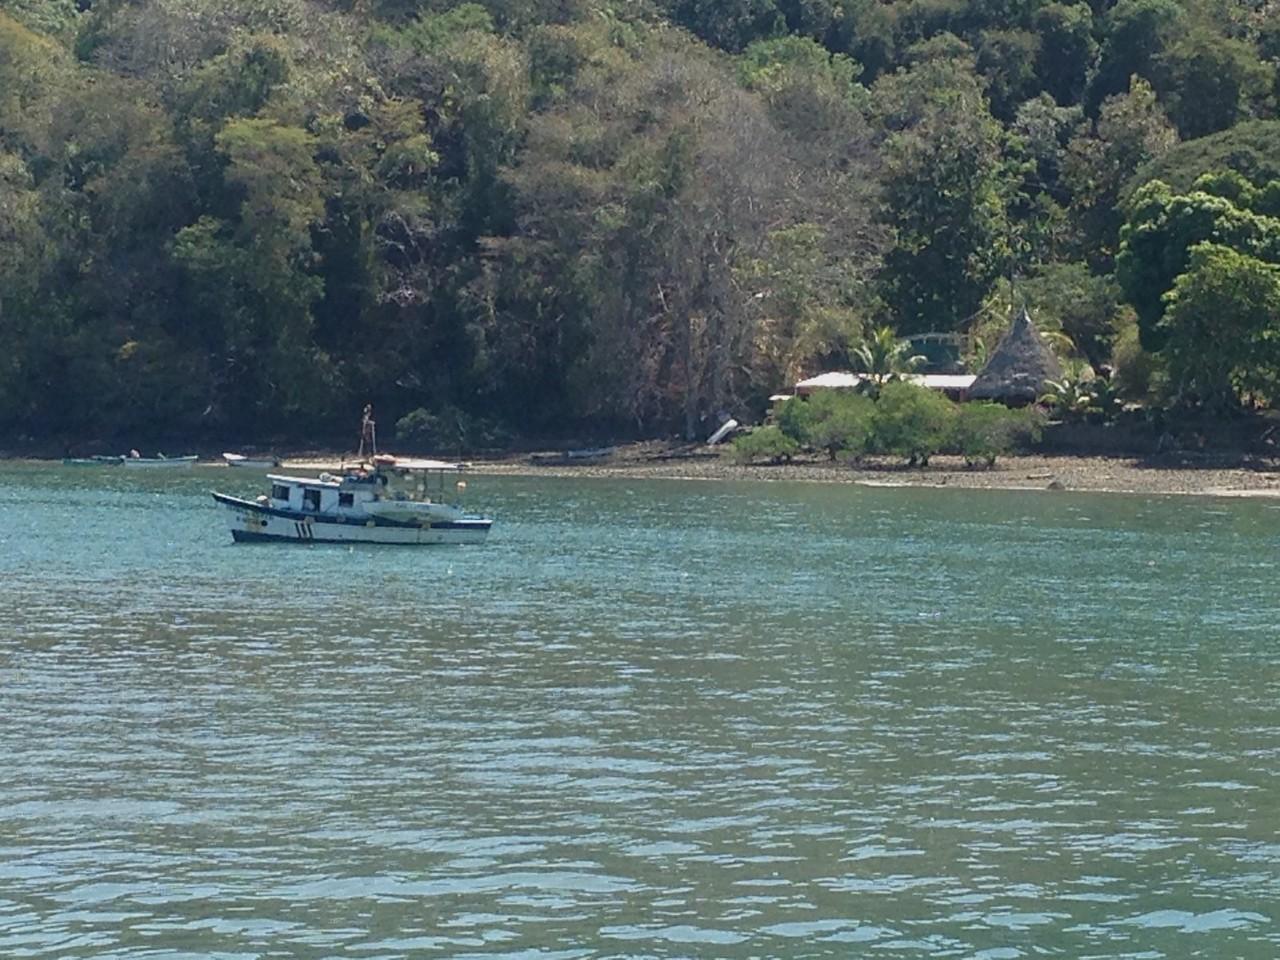 iPhone Photos of Costa Rica